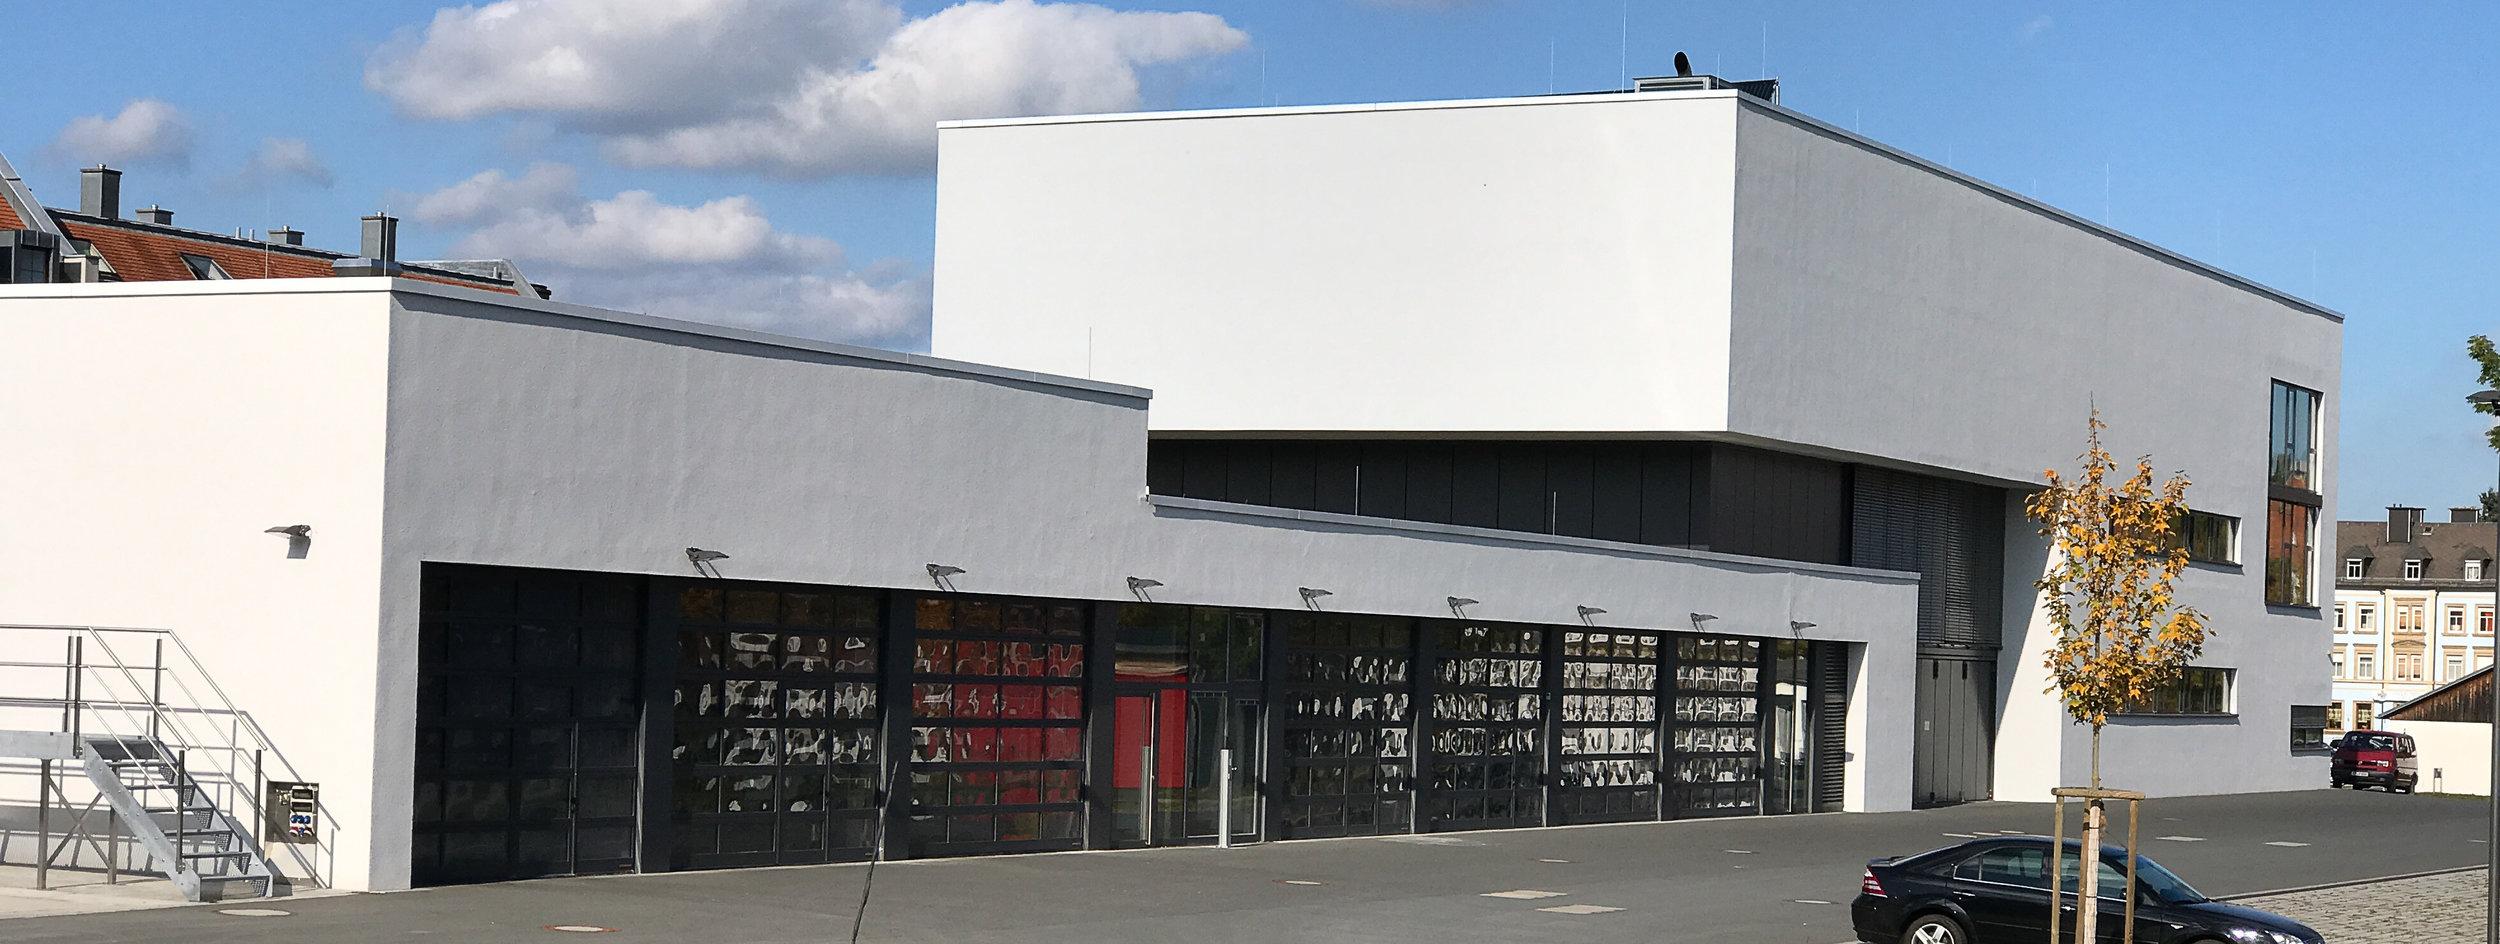 Bayreuth Training facility